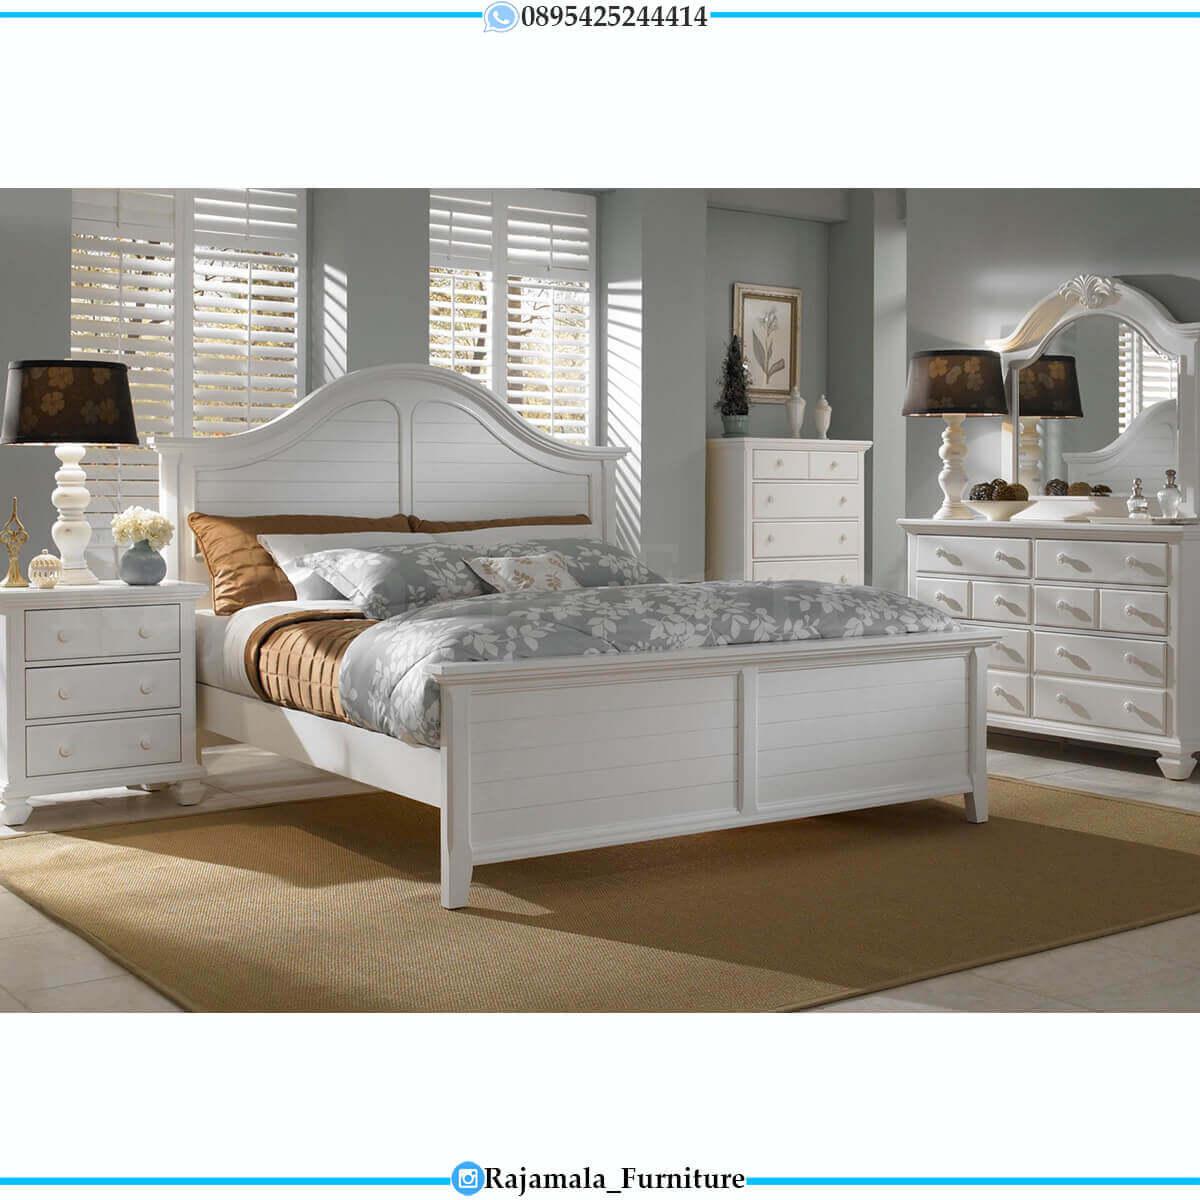 Tempat Tidur Minimalis Jepara Modern Simple Design Art Duco RM-0688